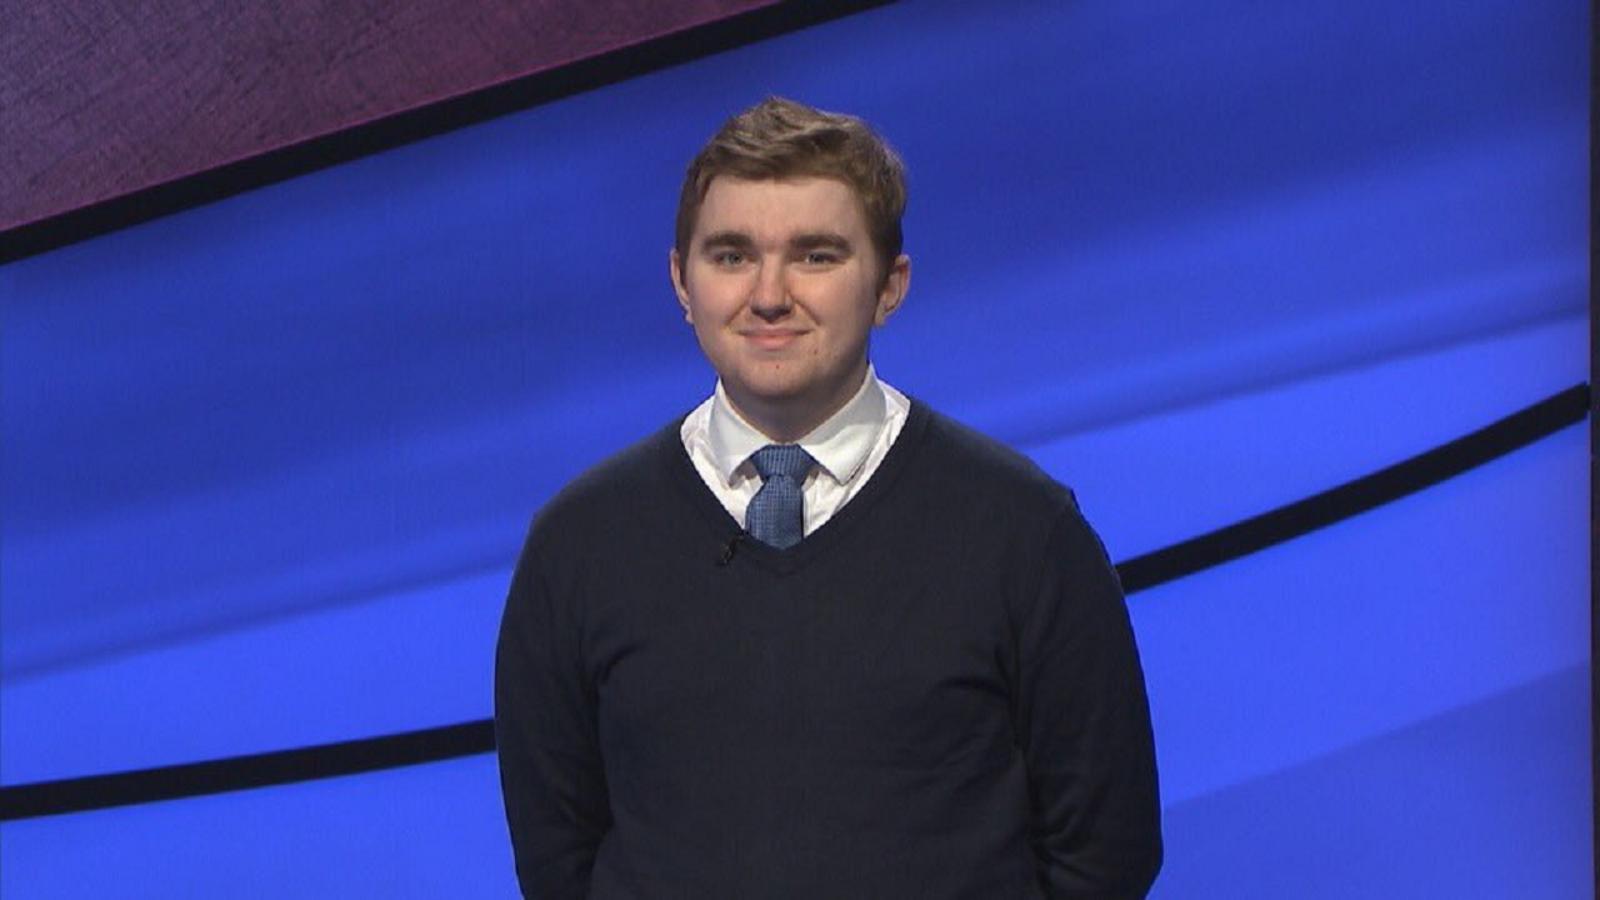 Brayden Smith, last 'Jeopardy!' champion during Alex Trebek's tenure, dies at age 24 - WLS-TV